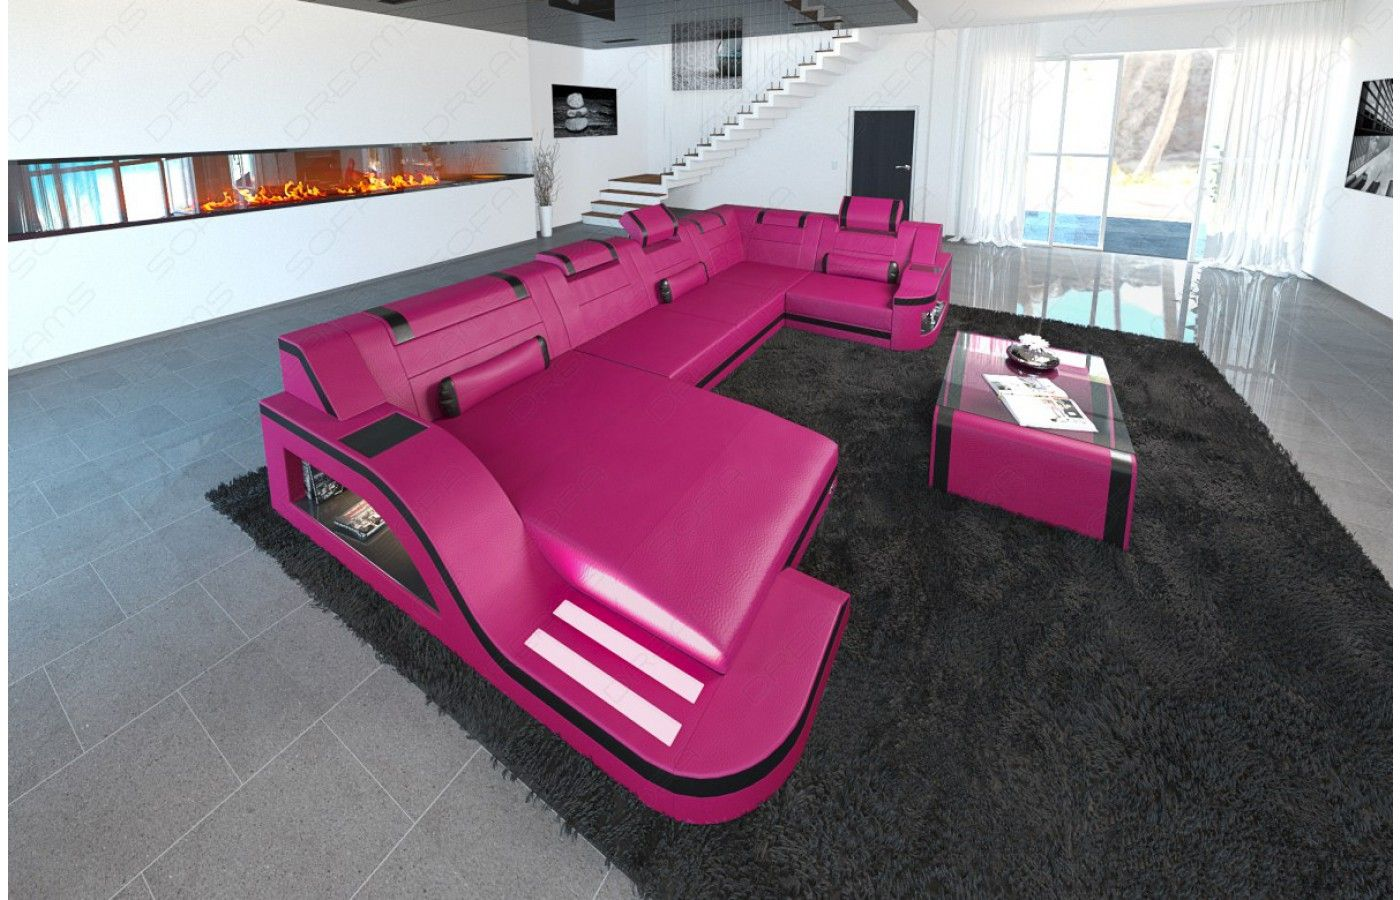 Design wohnlandschaft  Design #Wohnlandschaft PALERMO U Form mit #LED - Exklusiv bei ...